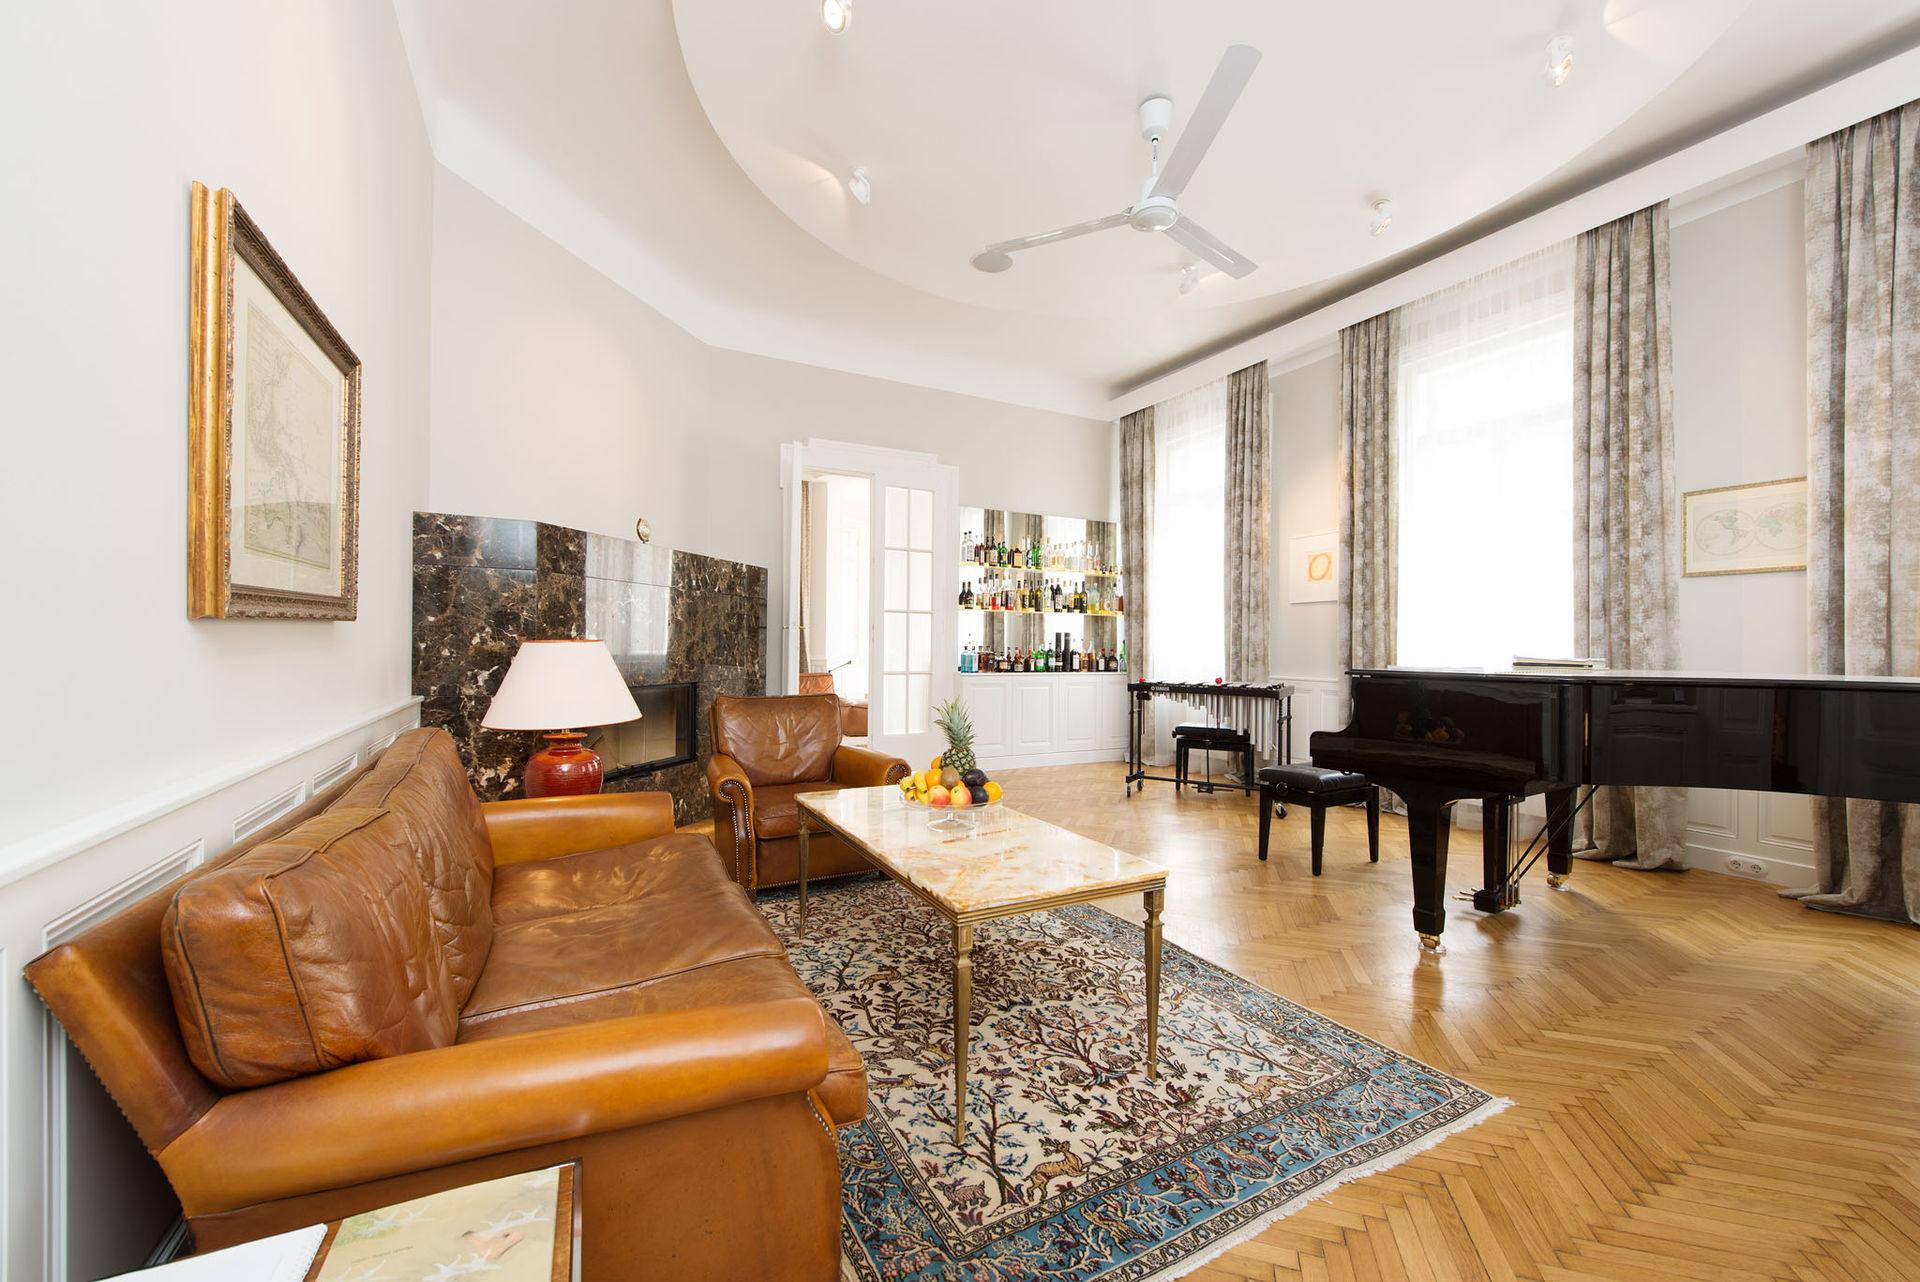 Vienna - close to City Centre - Luxury Apartment 140 sqm - Home Exchange